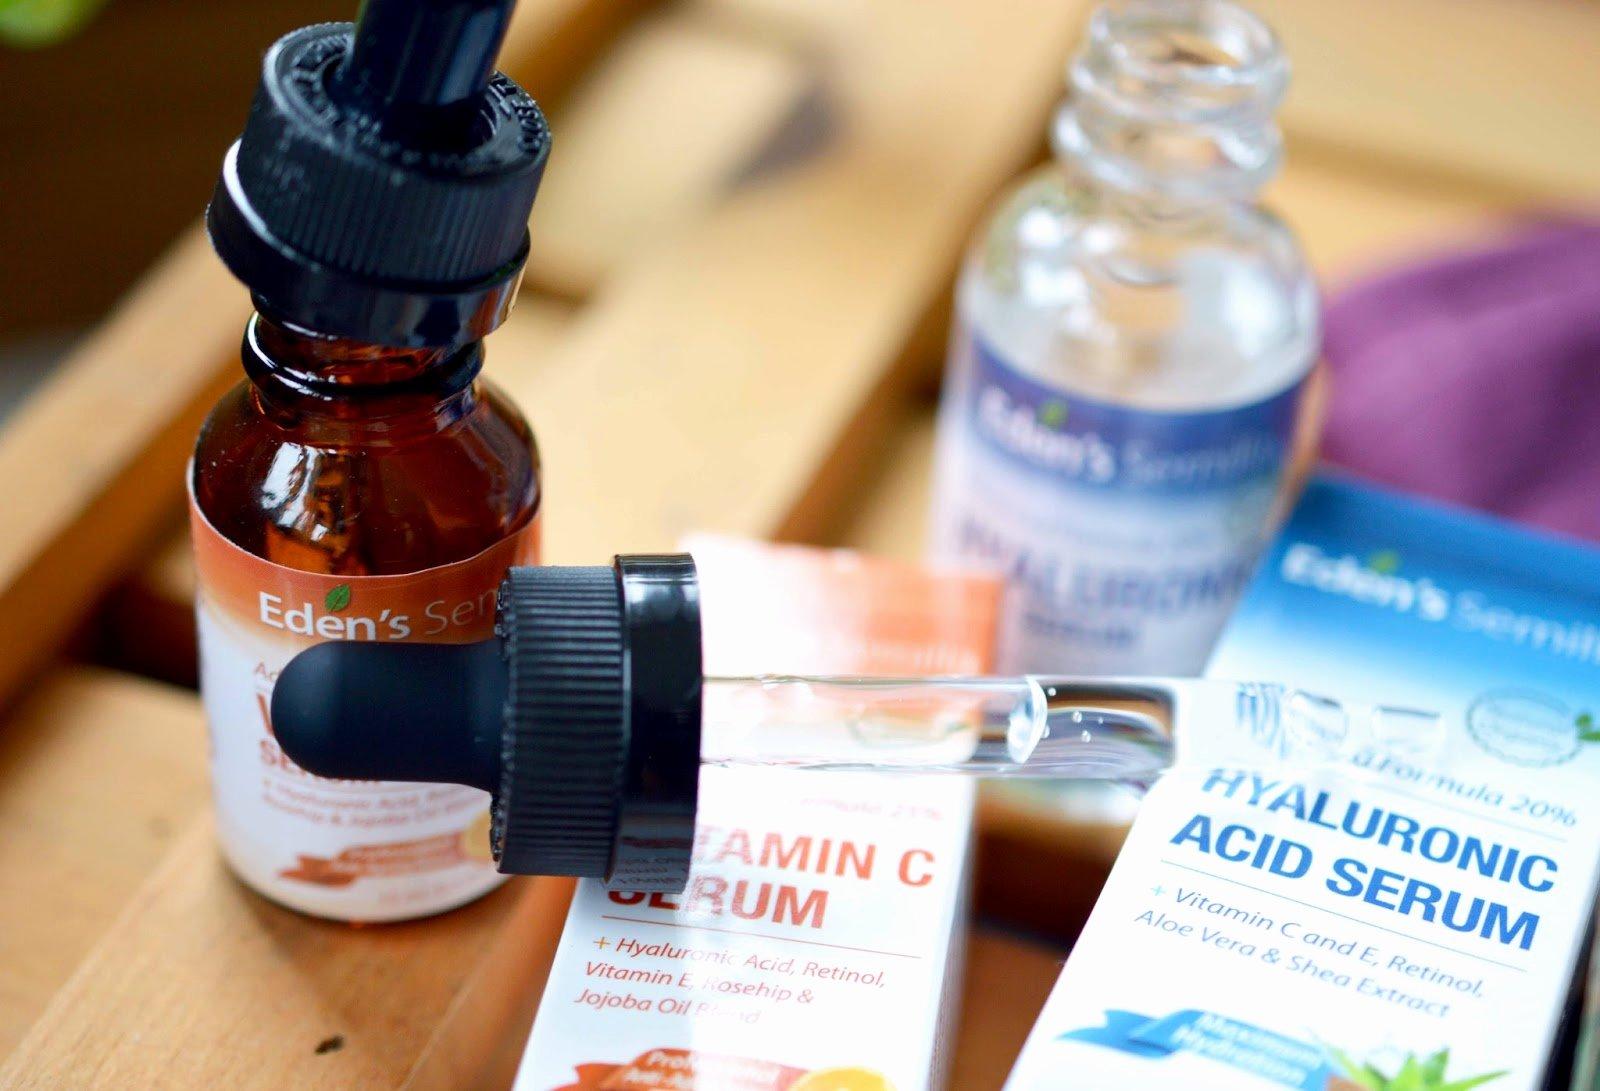 Vitamin Water Cheat Sheet Lovely Eden S Semilla Hyaluronic Acid & Vitamin C Serum